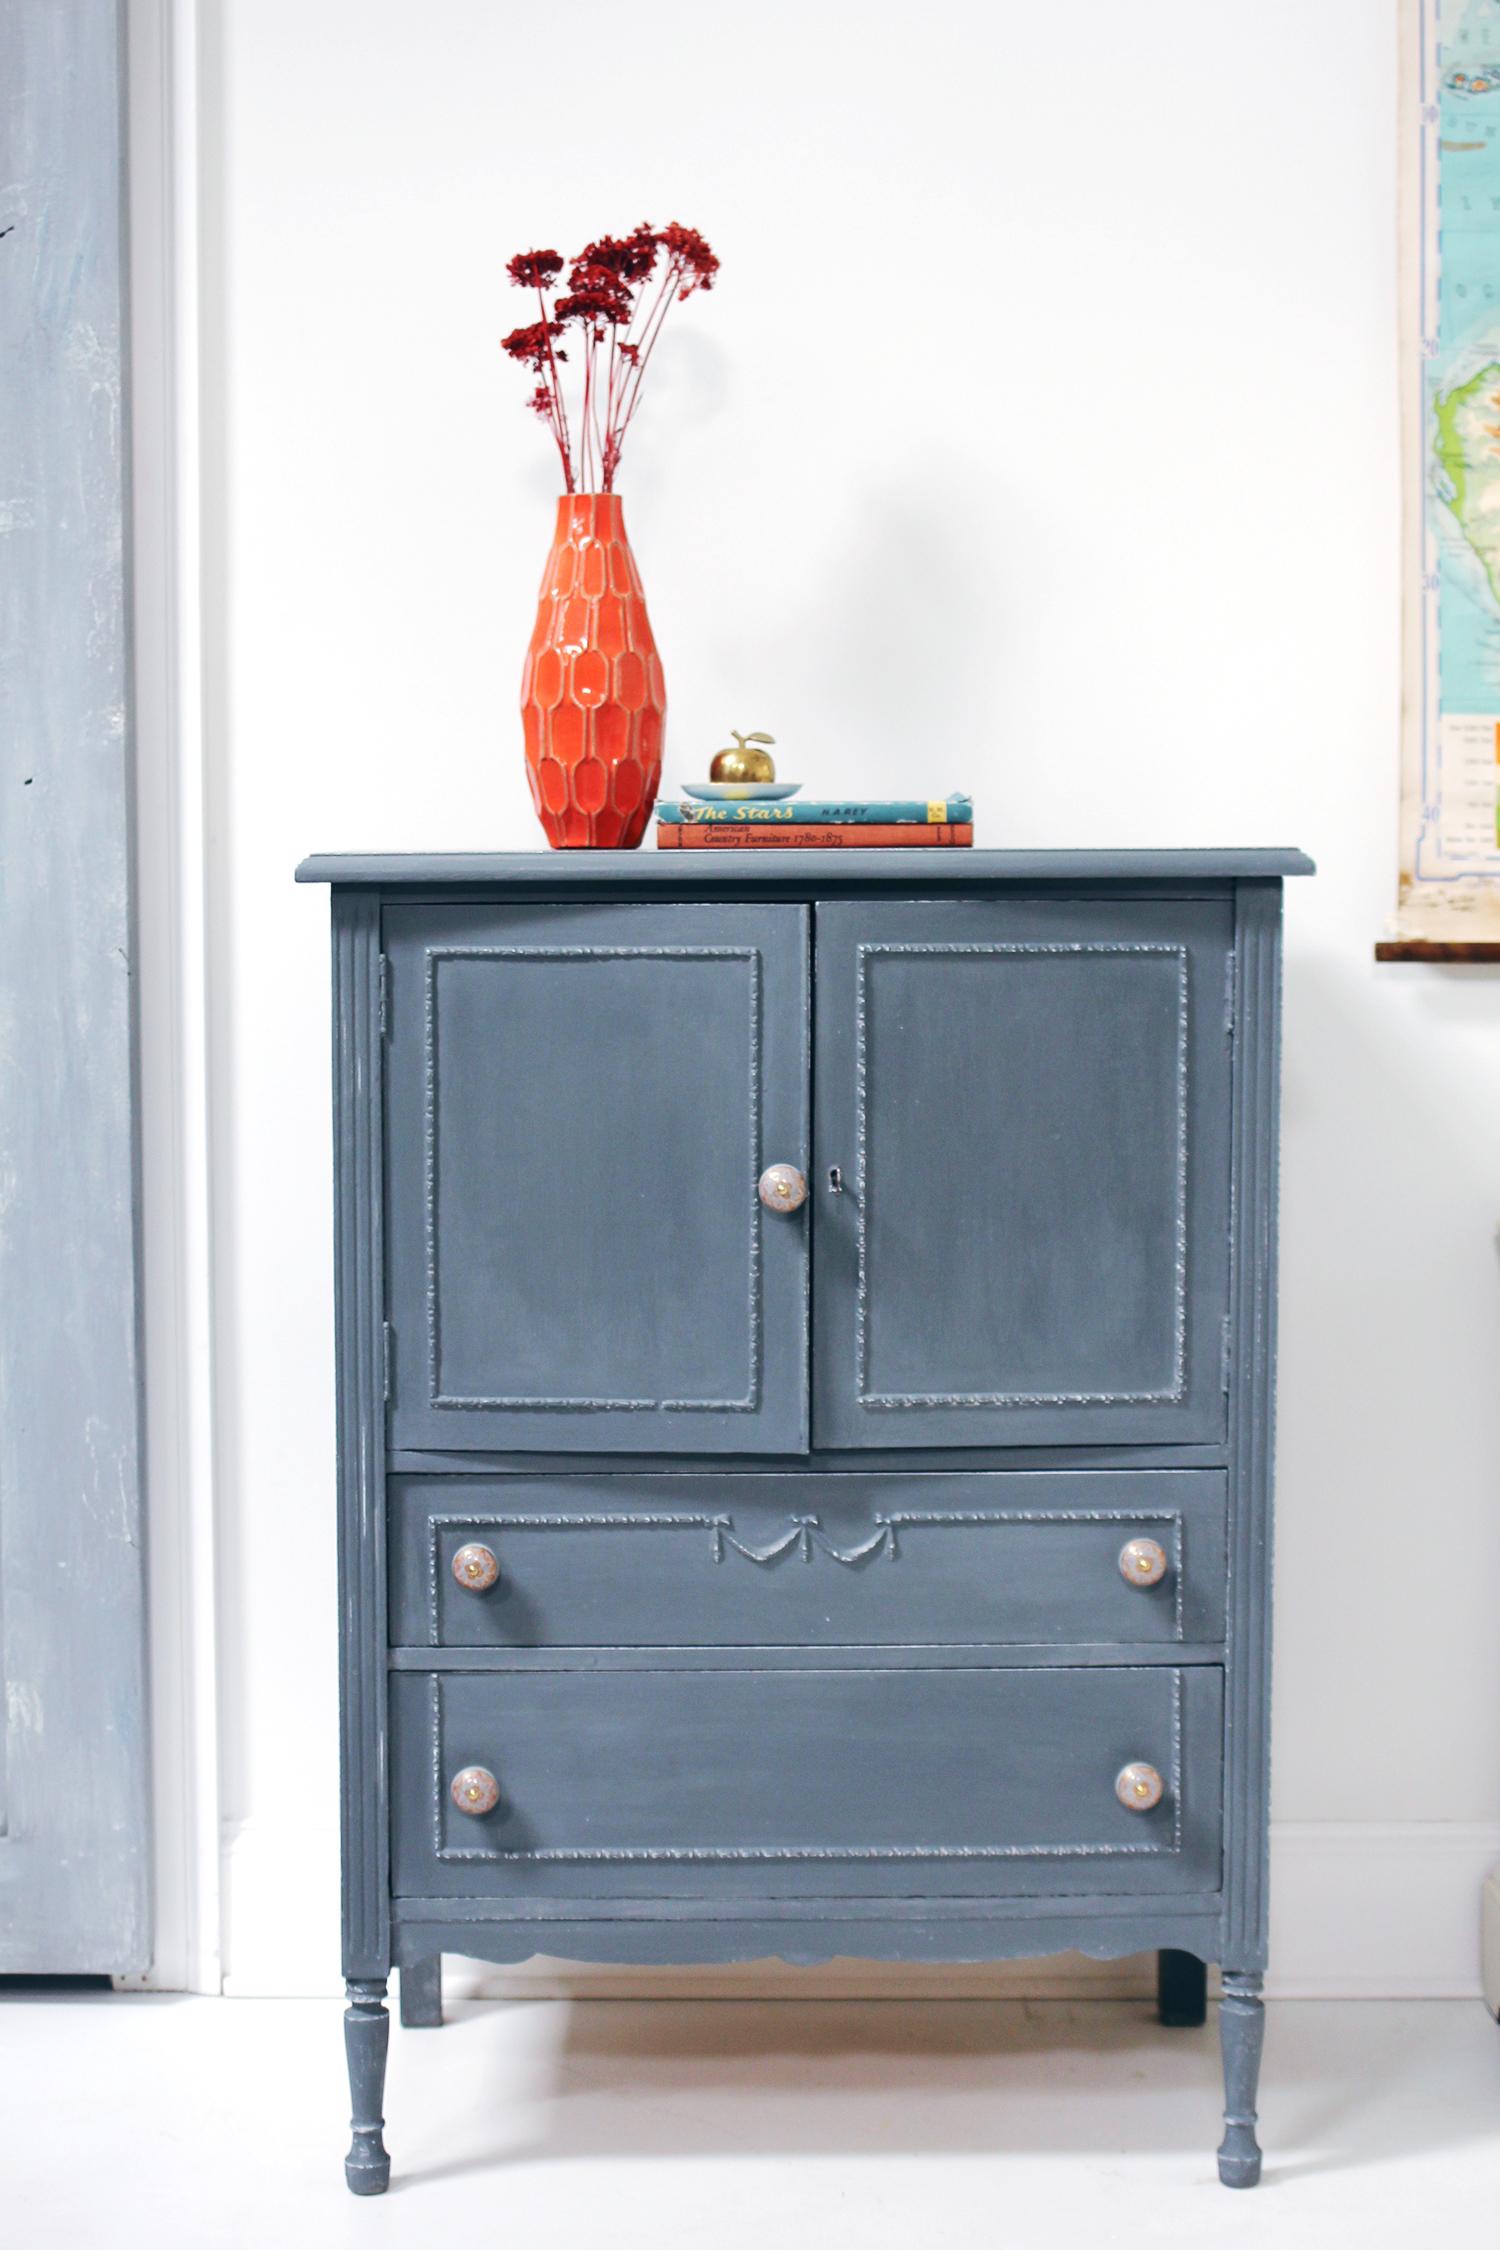 jo-torrijos-a-simpler-design-annie-sloan-french-linen-graphite-painted-gray-dresser-8.jpg